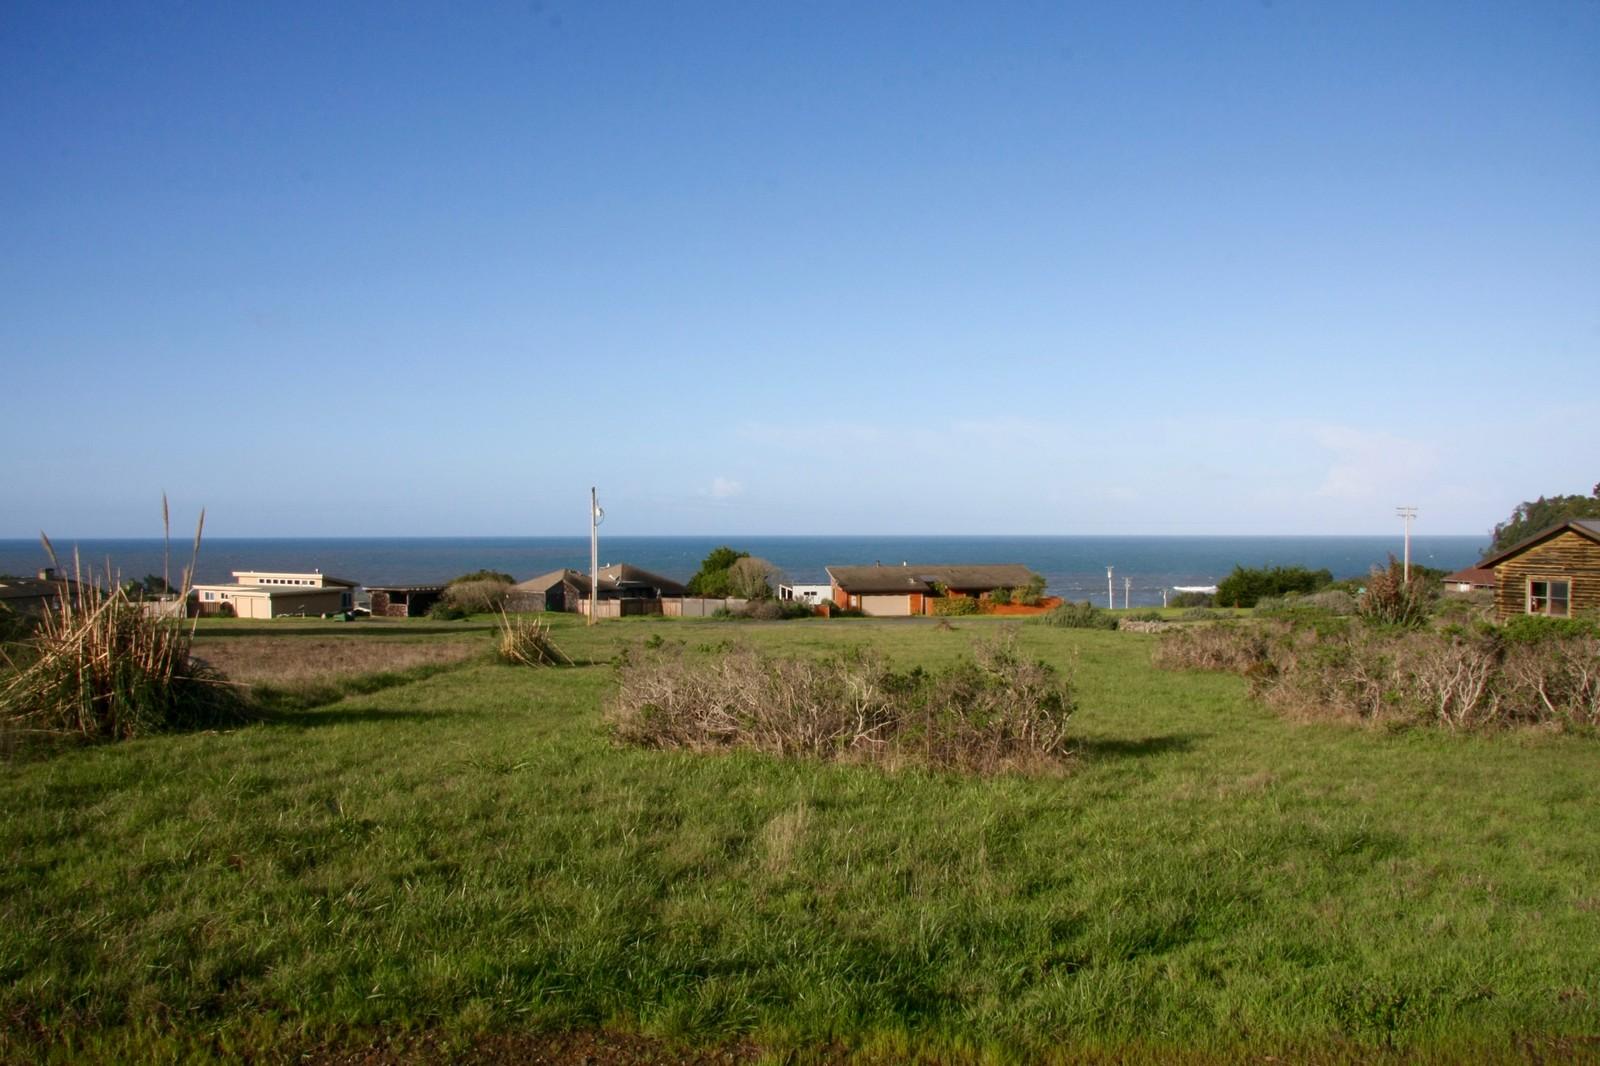 Land for Sale at 5388 Las Flores Road Bodega Bay, California 94923 United States